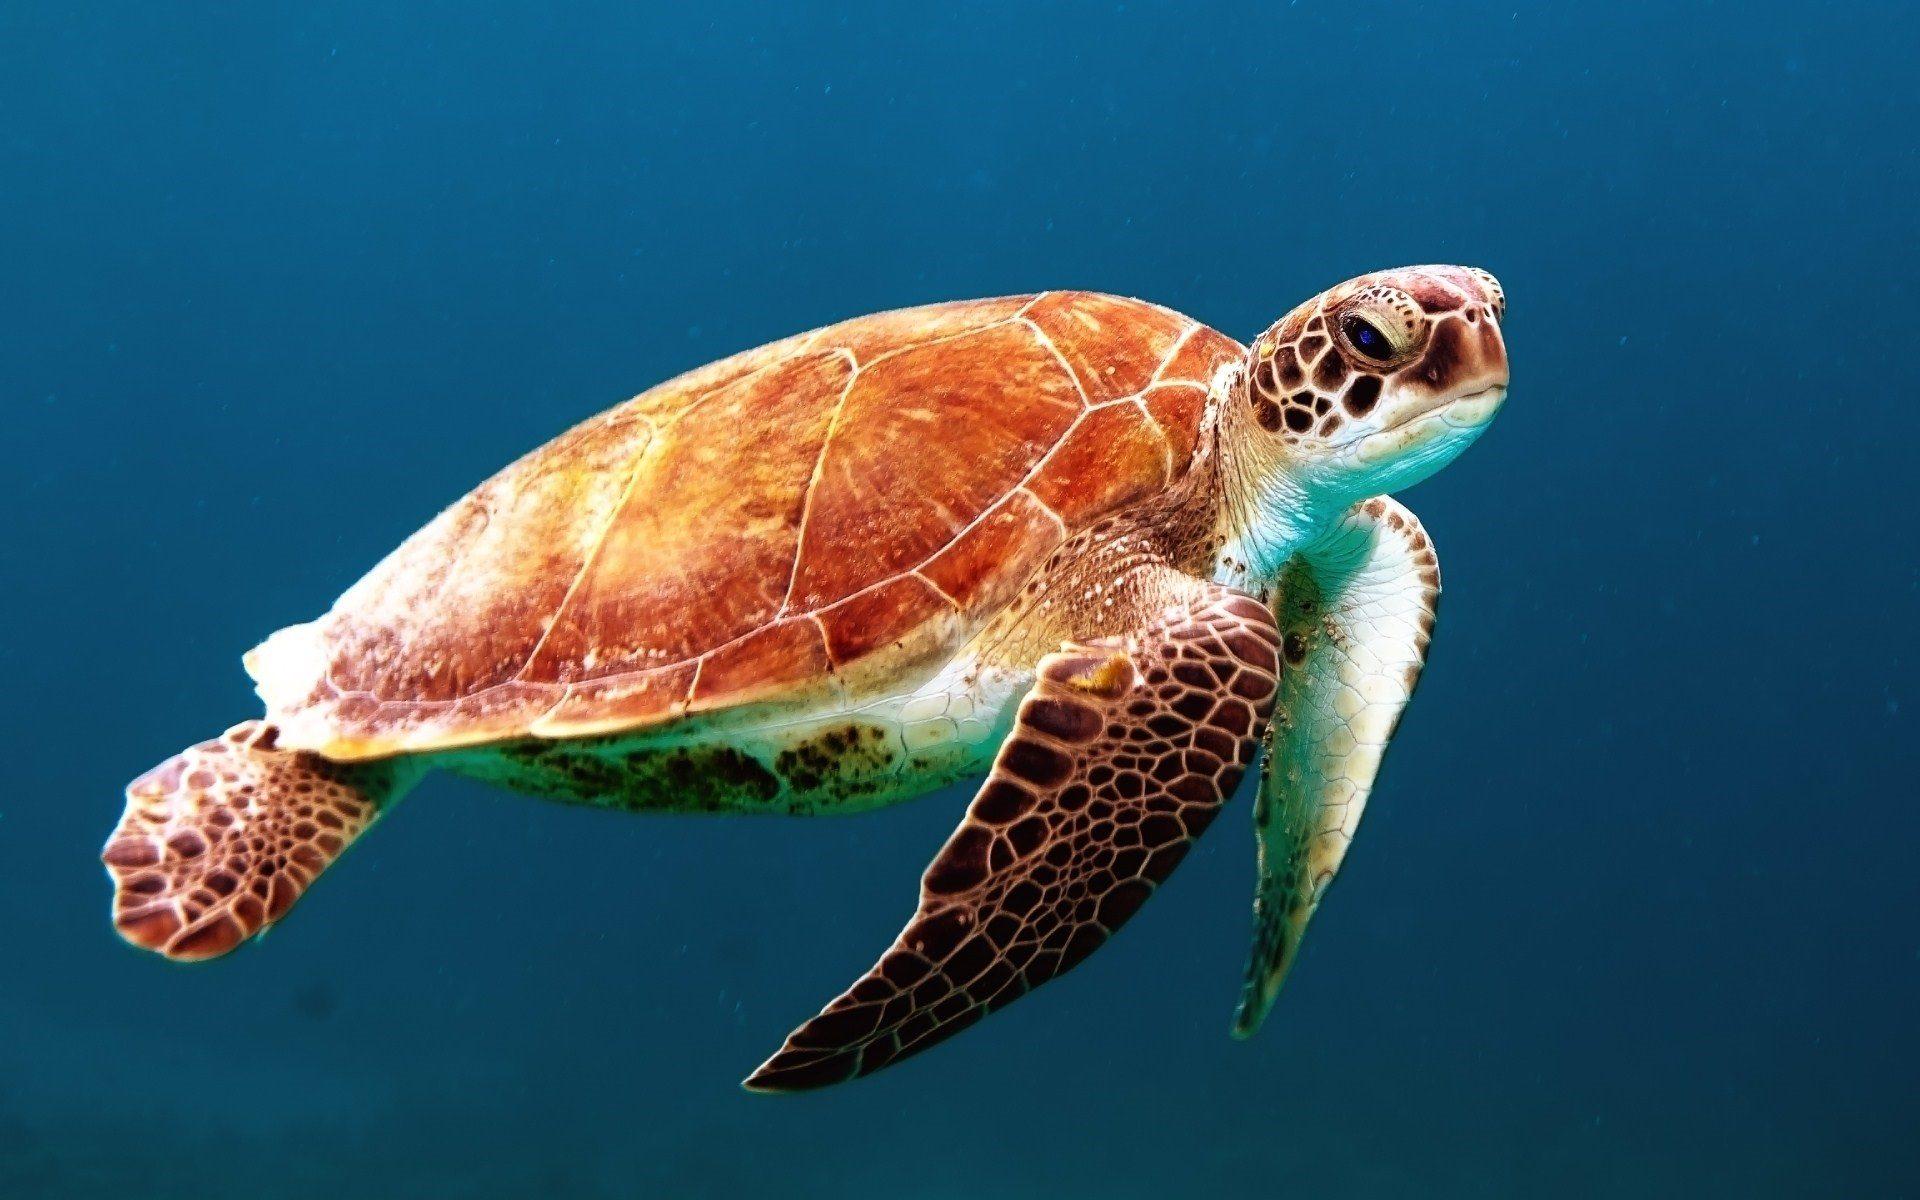 Schildkröte, Marina, Ozean, Unterwasser, bunte - Wallpaper HD - Prof.-falken.com